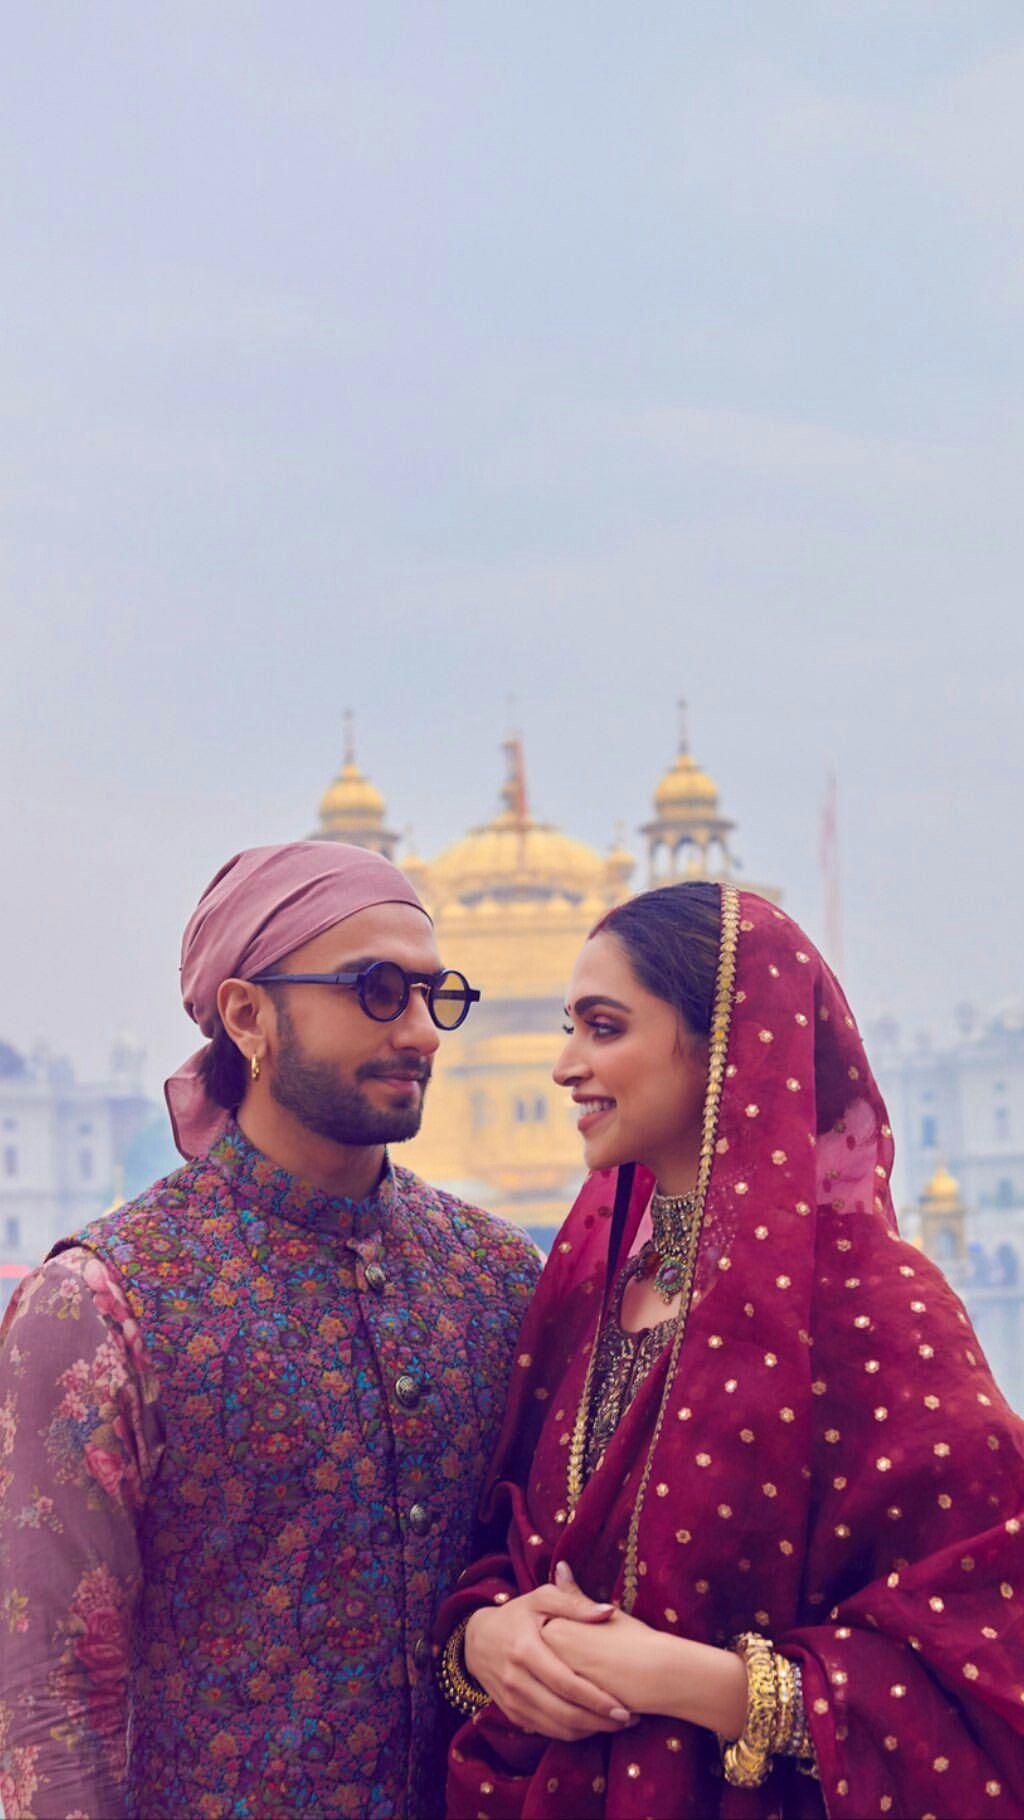 Deepika Padukone And Ranveer Singh At The Golden Temple In Amritsar Today Deepveer Pemandangan